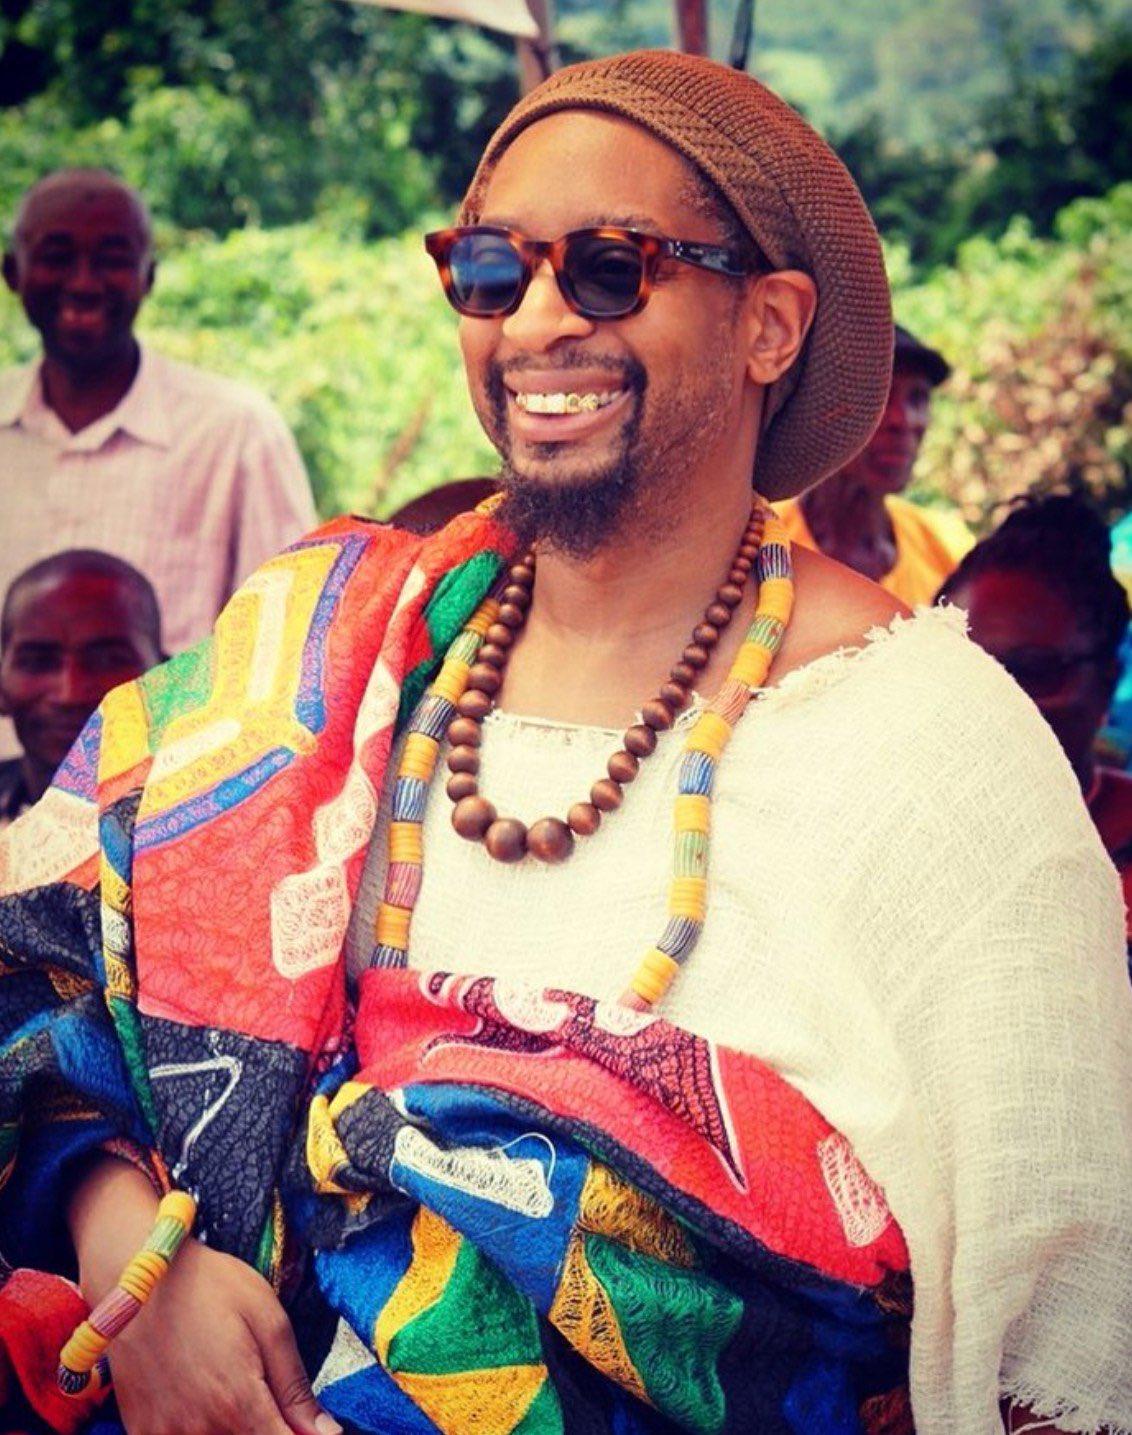 Lil Jon Opens His Second School In Ghana: https://t.co/9dc9eh9A82 https://t.co/jwVtUMSxtp